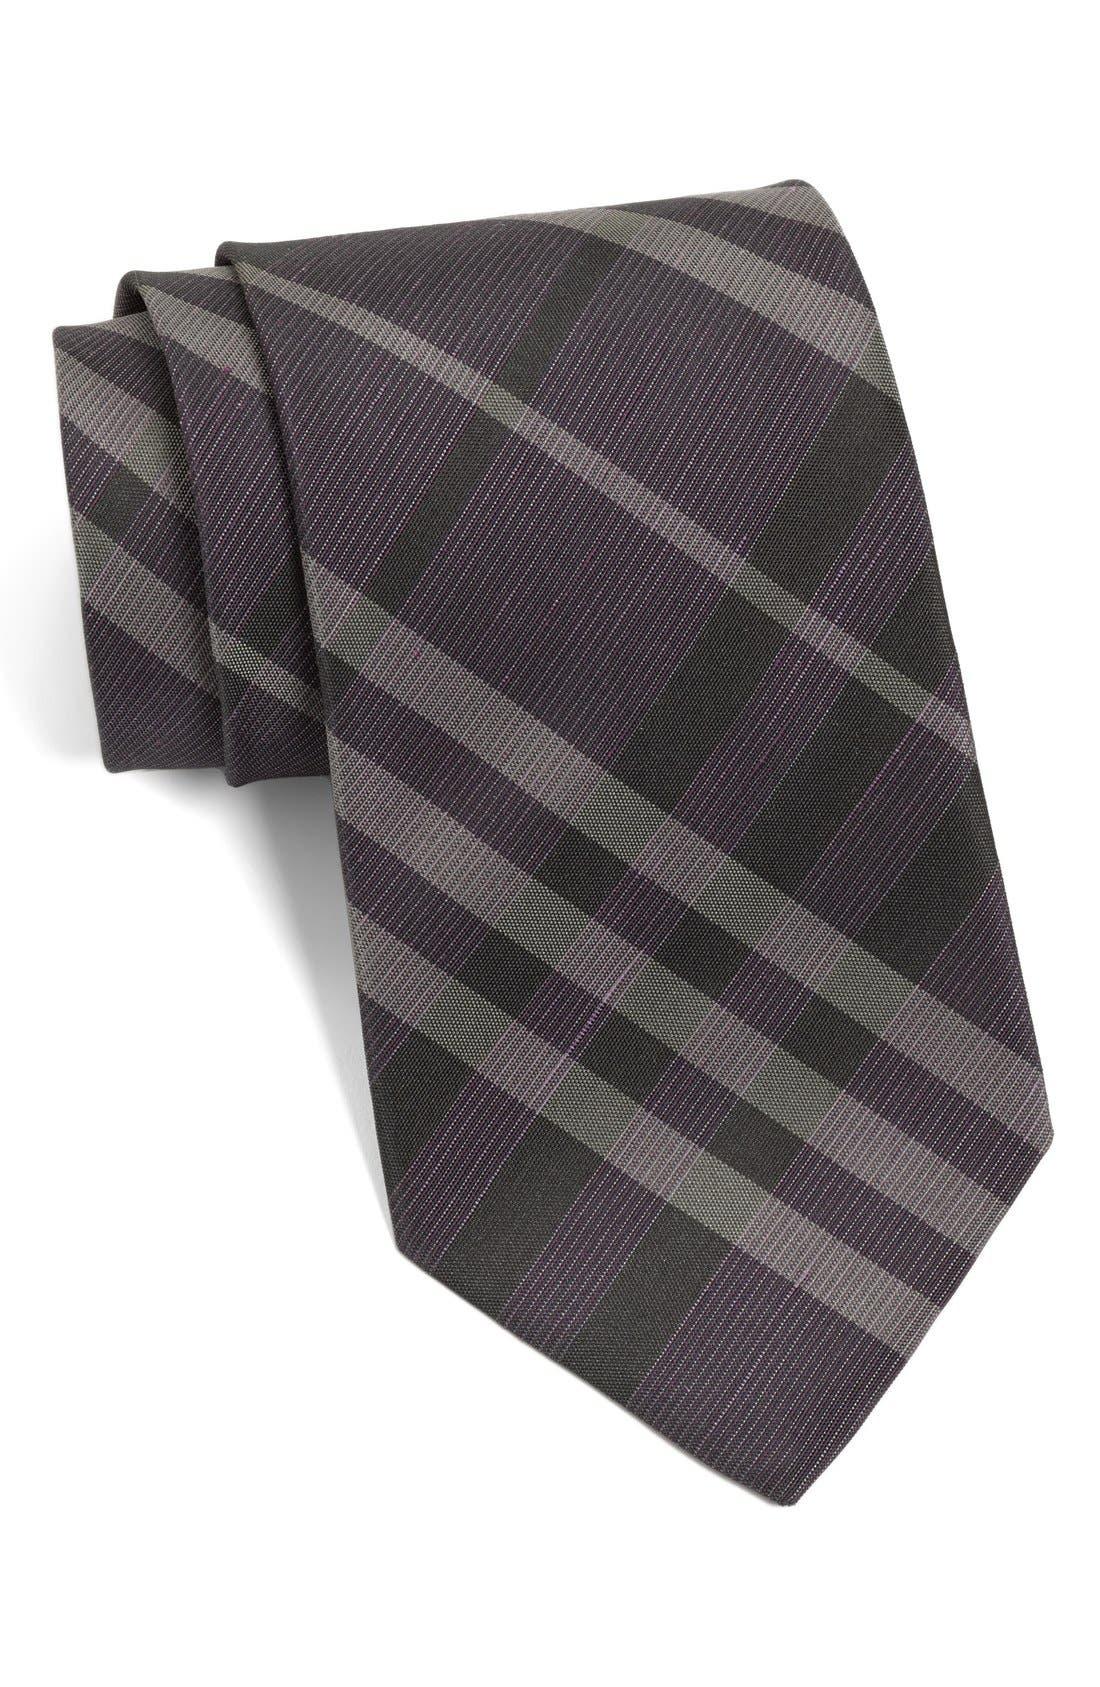 Alternate Image 1 Selected - Burberry London 'Regent' Woven Silk & Linen Tie